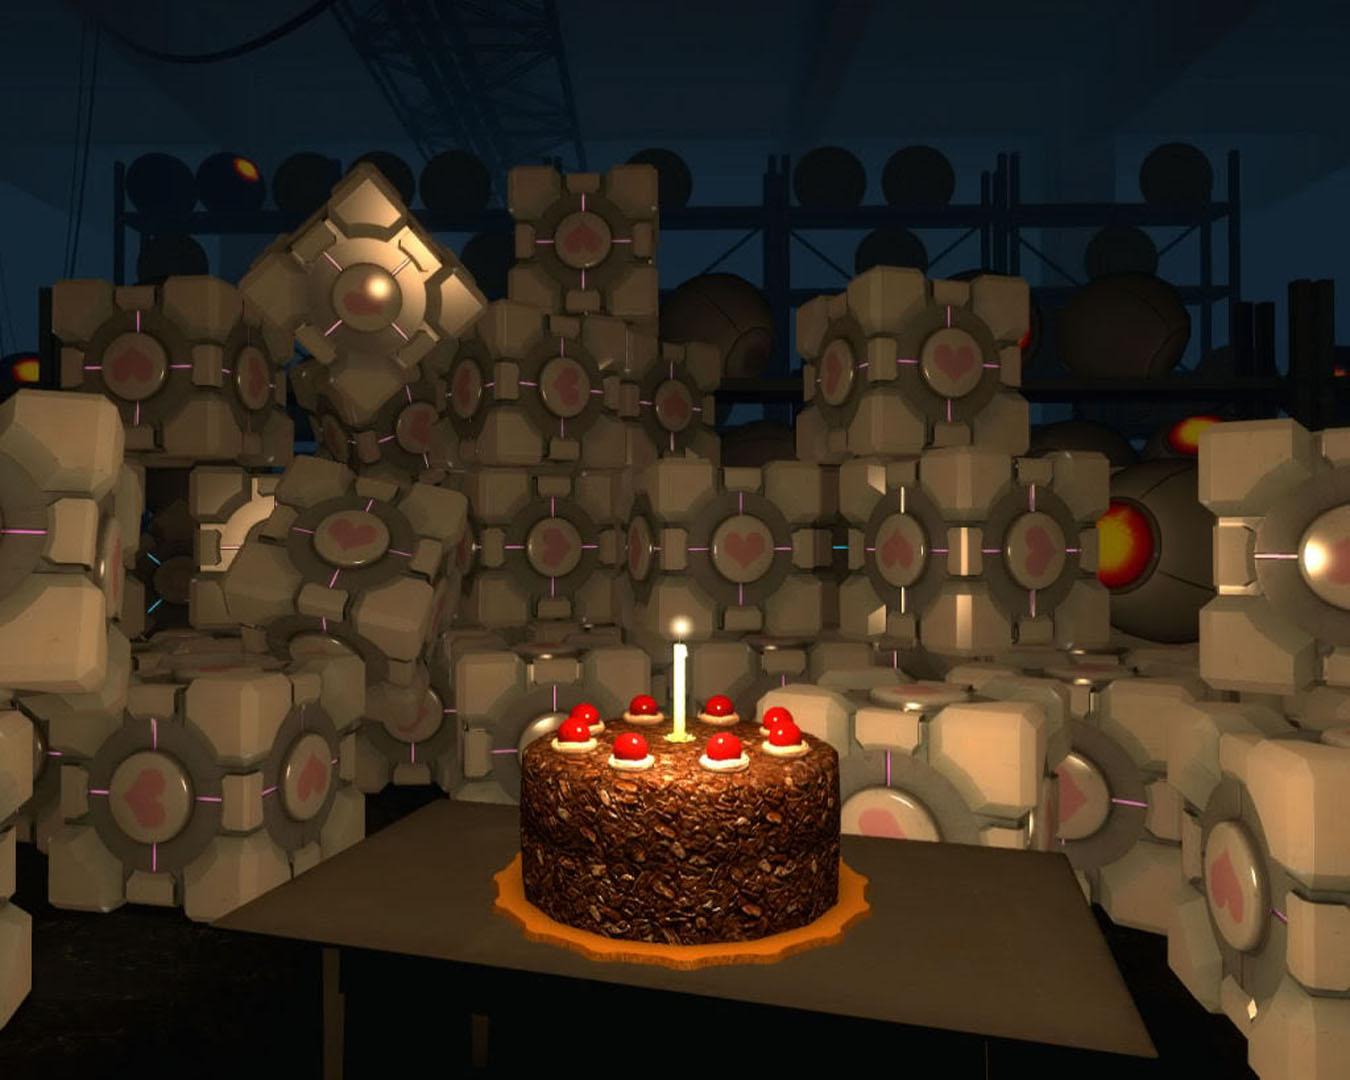 Cake And A Thousand Companion Cubes